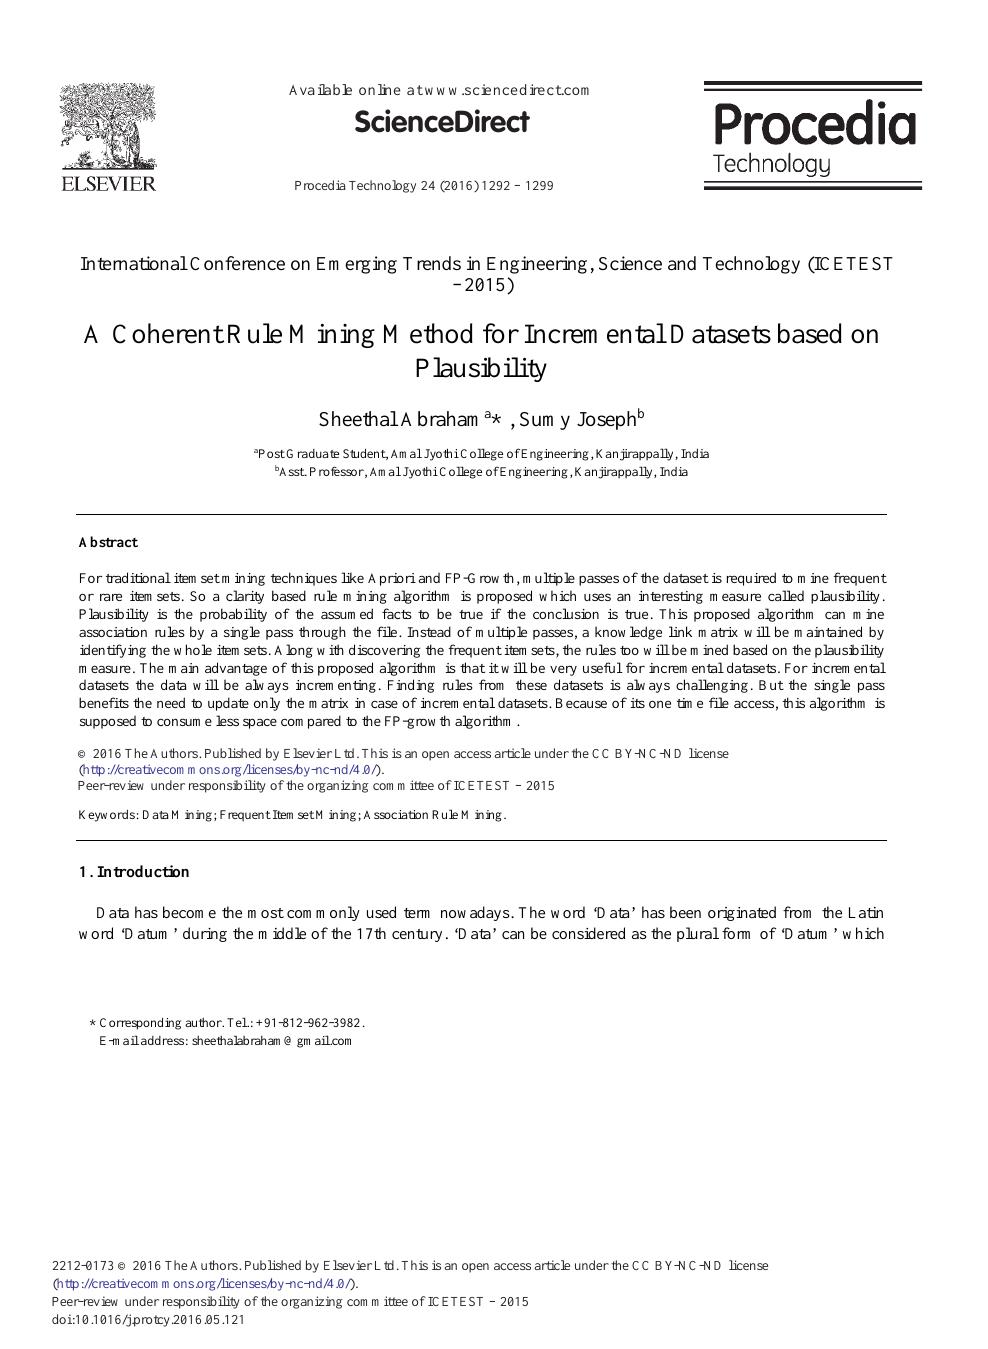 A Coherent Rule Mining Method for Incremental Datasets Based